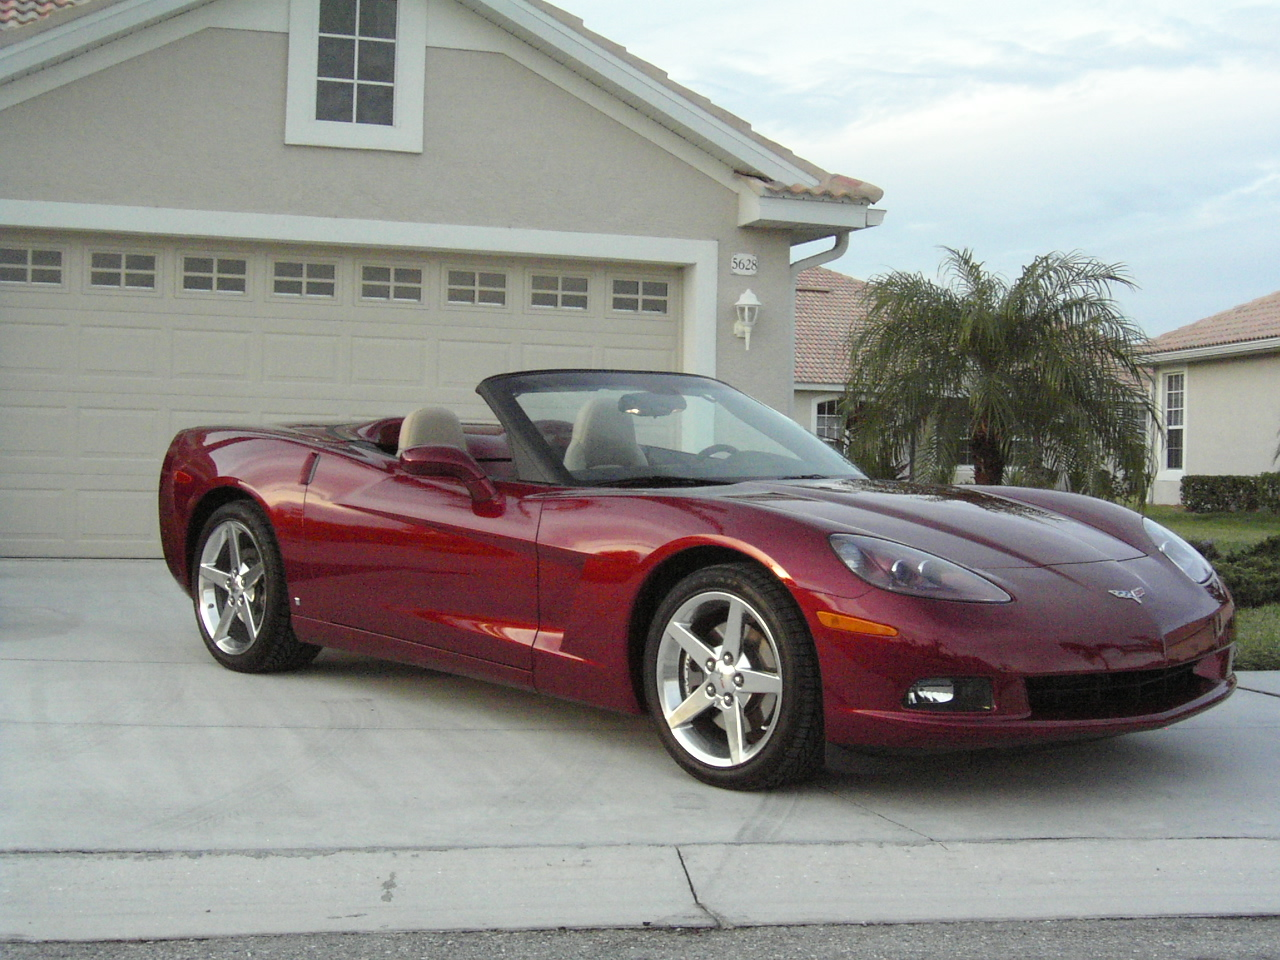 Used 2007 Chevrolet Corvette For Sale In Edmunds Autos Post